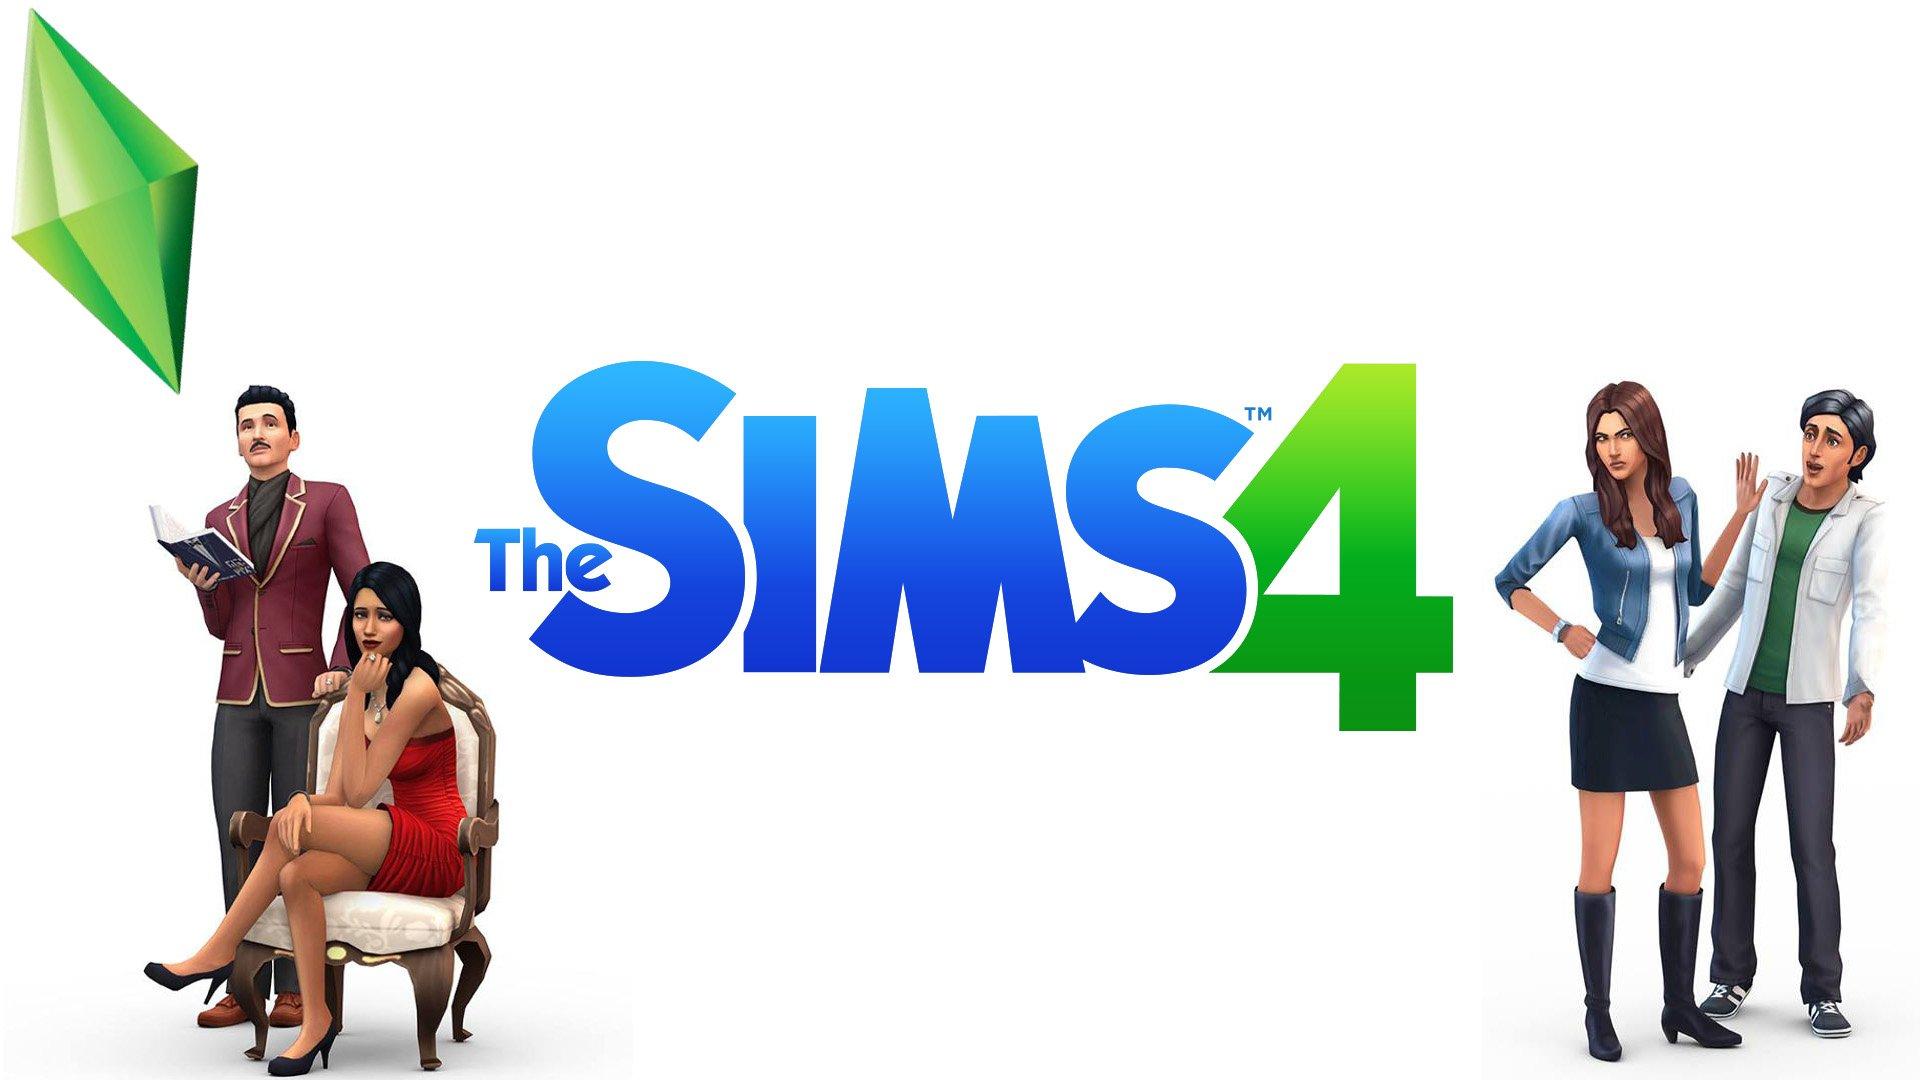 Постер The Sims 4